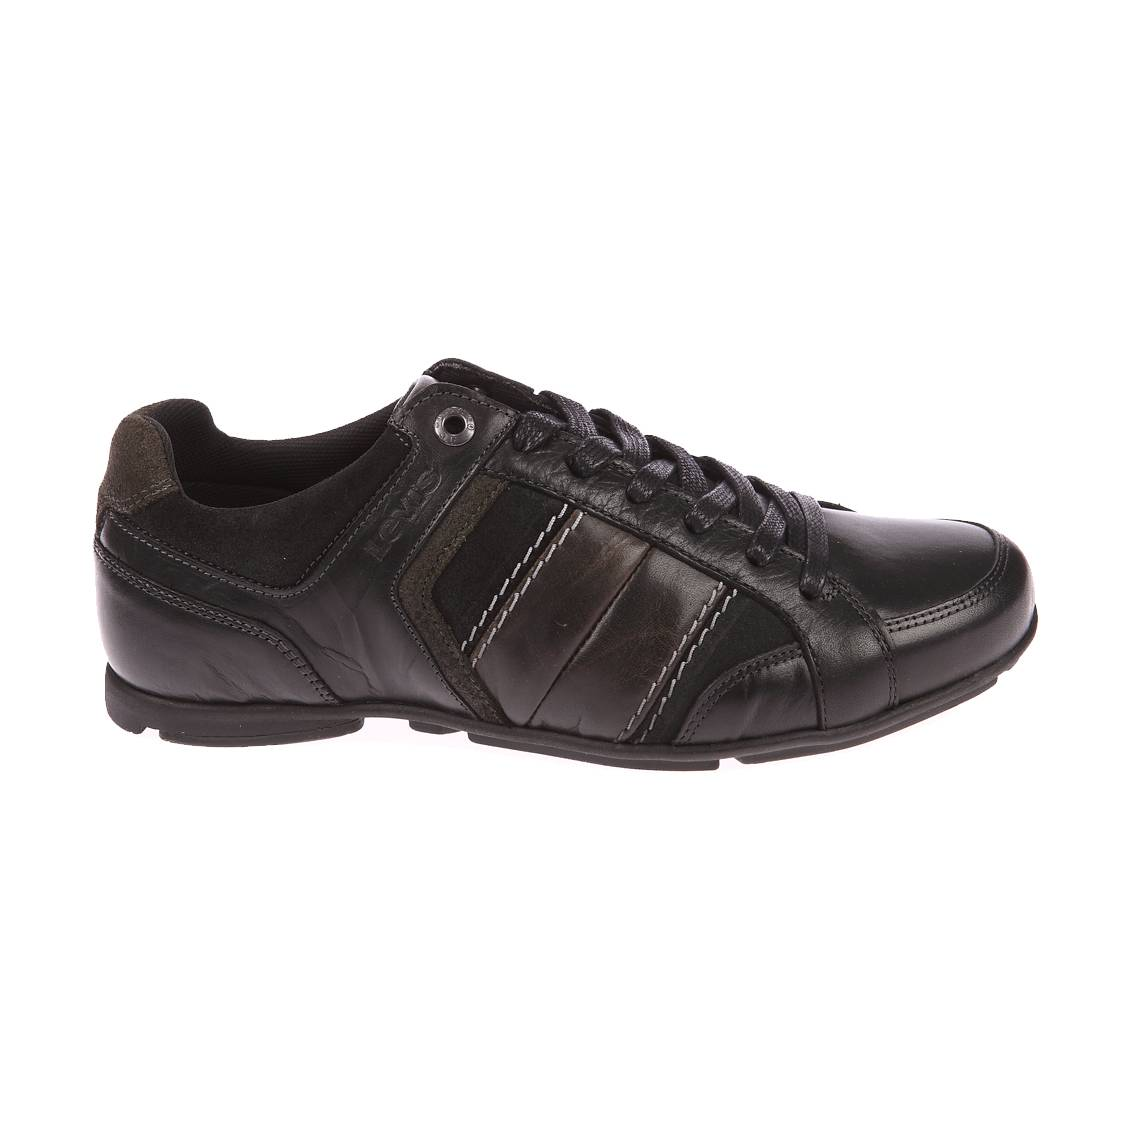 Chaussures Jenkks Levi's en cuir et empiècement nubuck. Chaussures Levi's- Cuir (100%)- Côté de la chaussure en cuir nubuck noir-